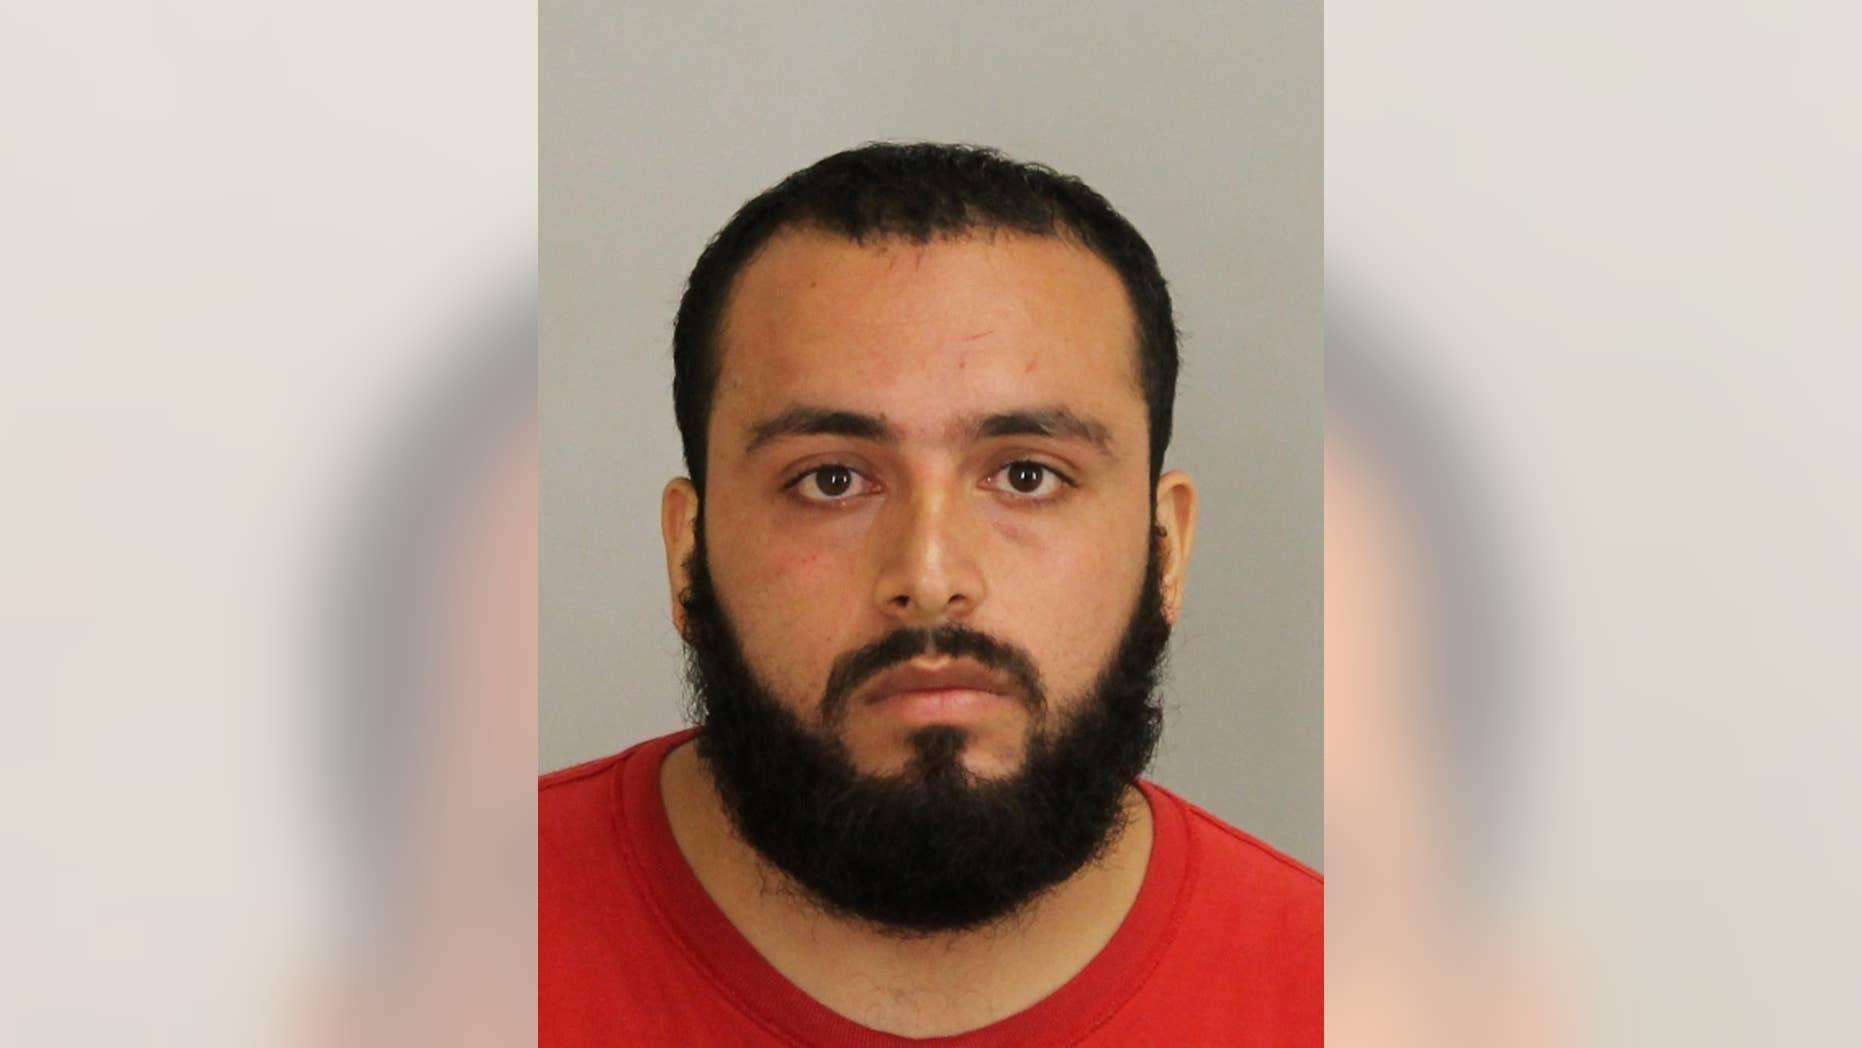 This September 2016 file photo provided by Union County Prosecutor's Office shows Ahmad Khan Rahimi.